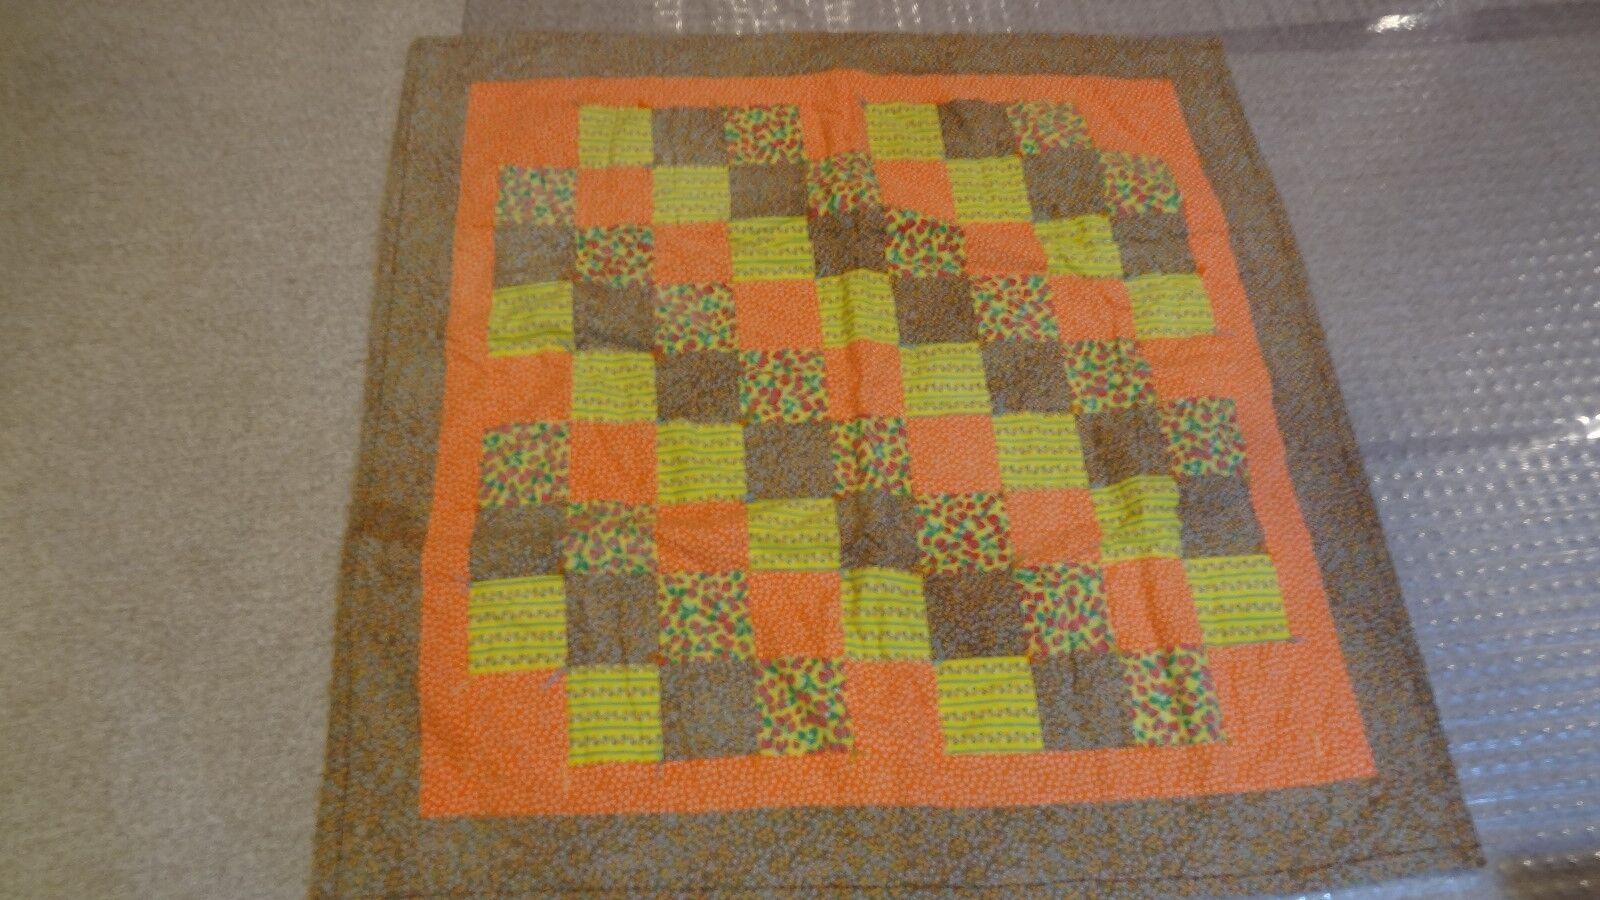 Handmade Machine Stitched Yellow Orange Checker Board Baby Quilt 44 x 44